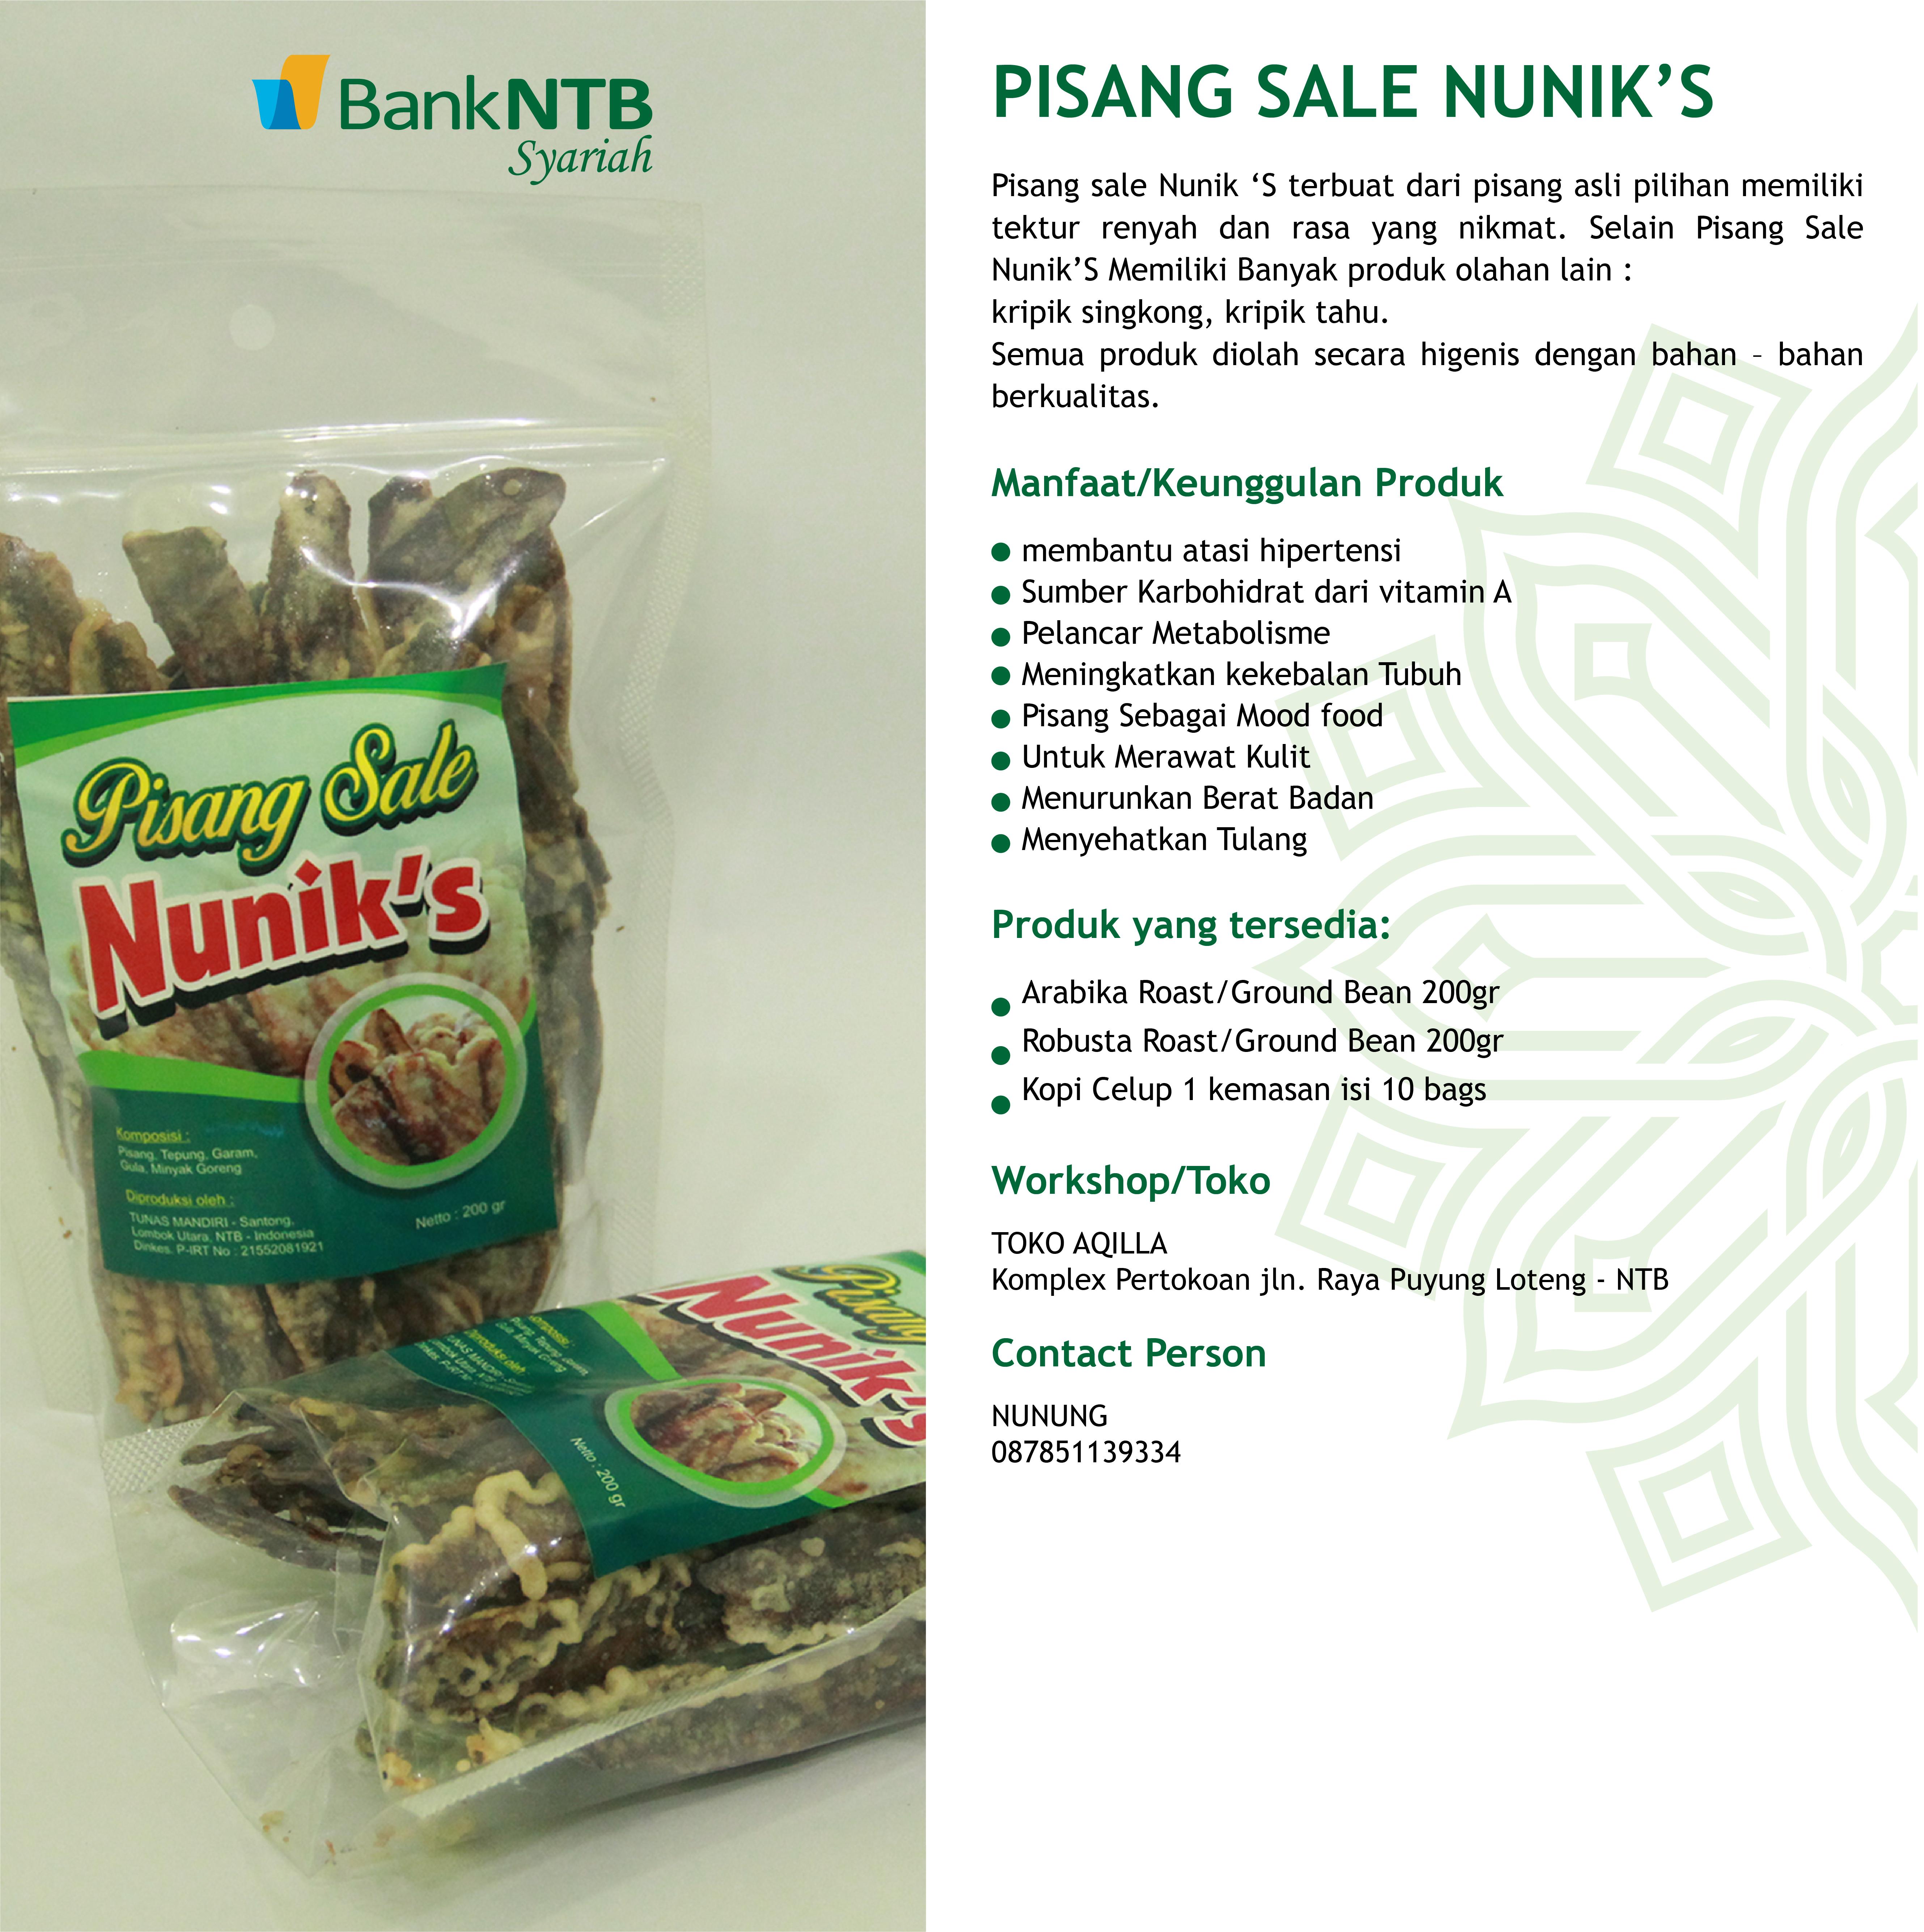 Pisang_Sale_Nunik_s.html